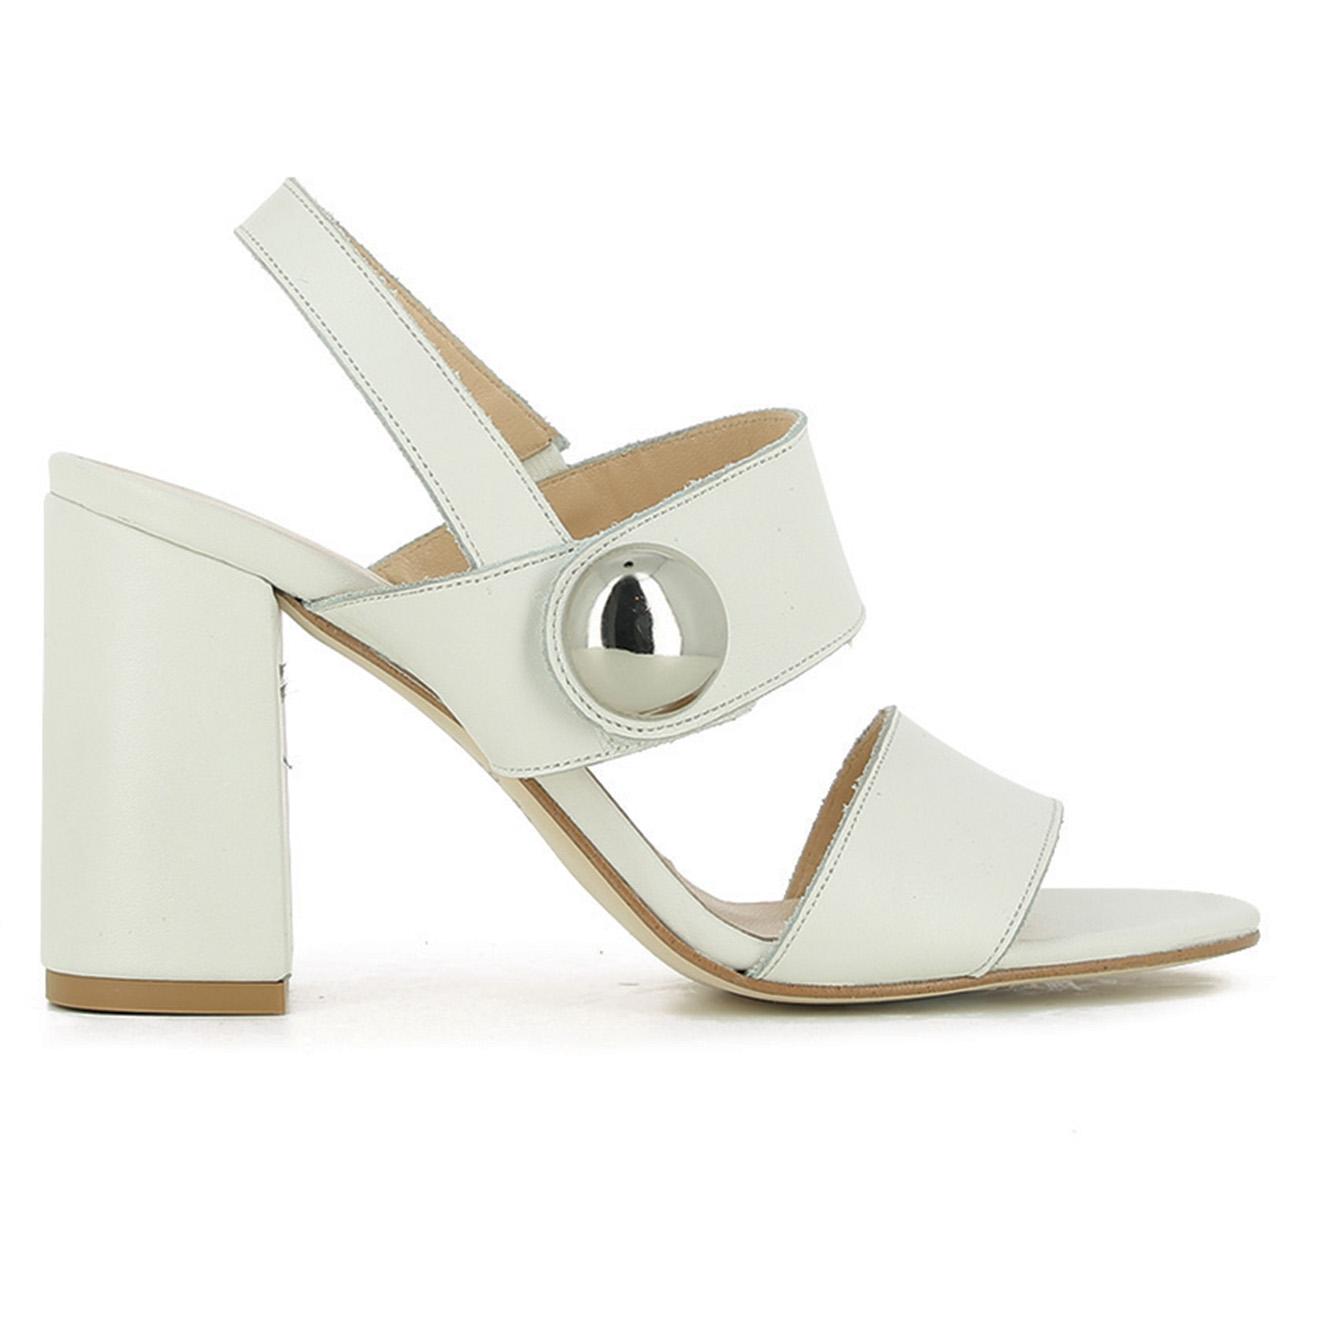 Sandales en Cuir Derika écrues - Talon 10 cm - Jonak - Modalova